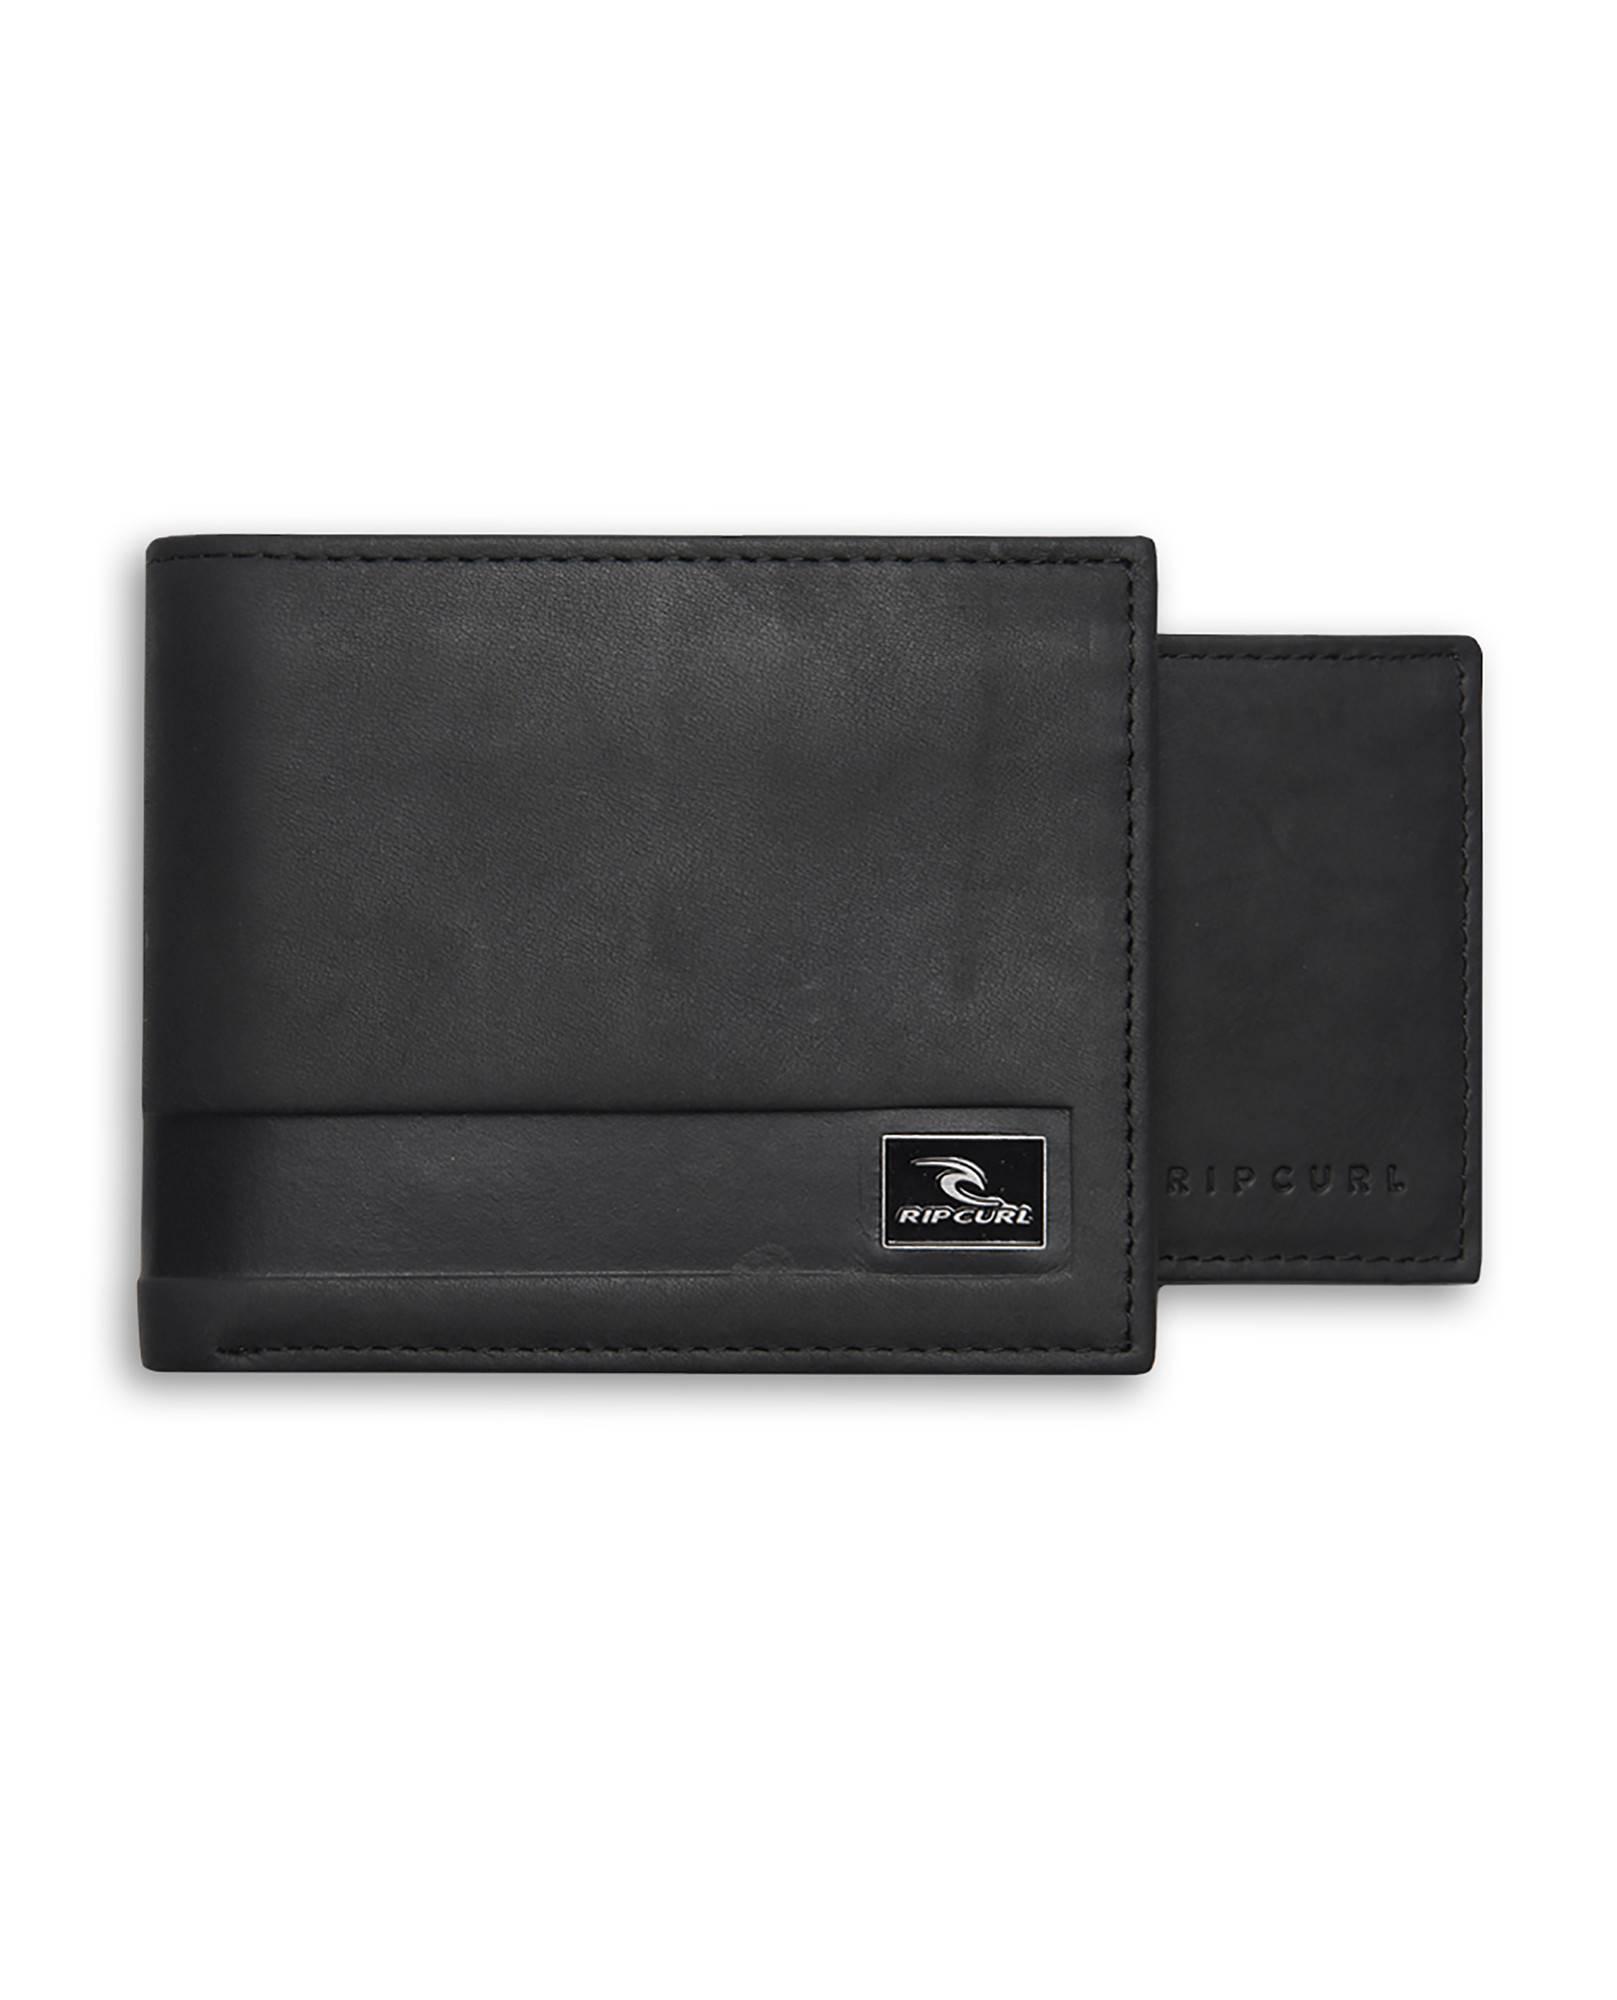 Peňaženka pánska RIP CURL SECTION RFID 2 IN 1